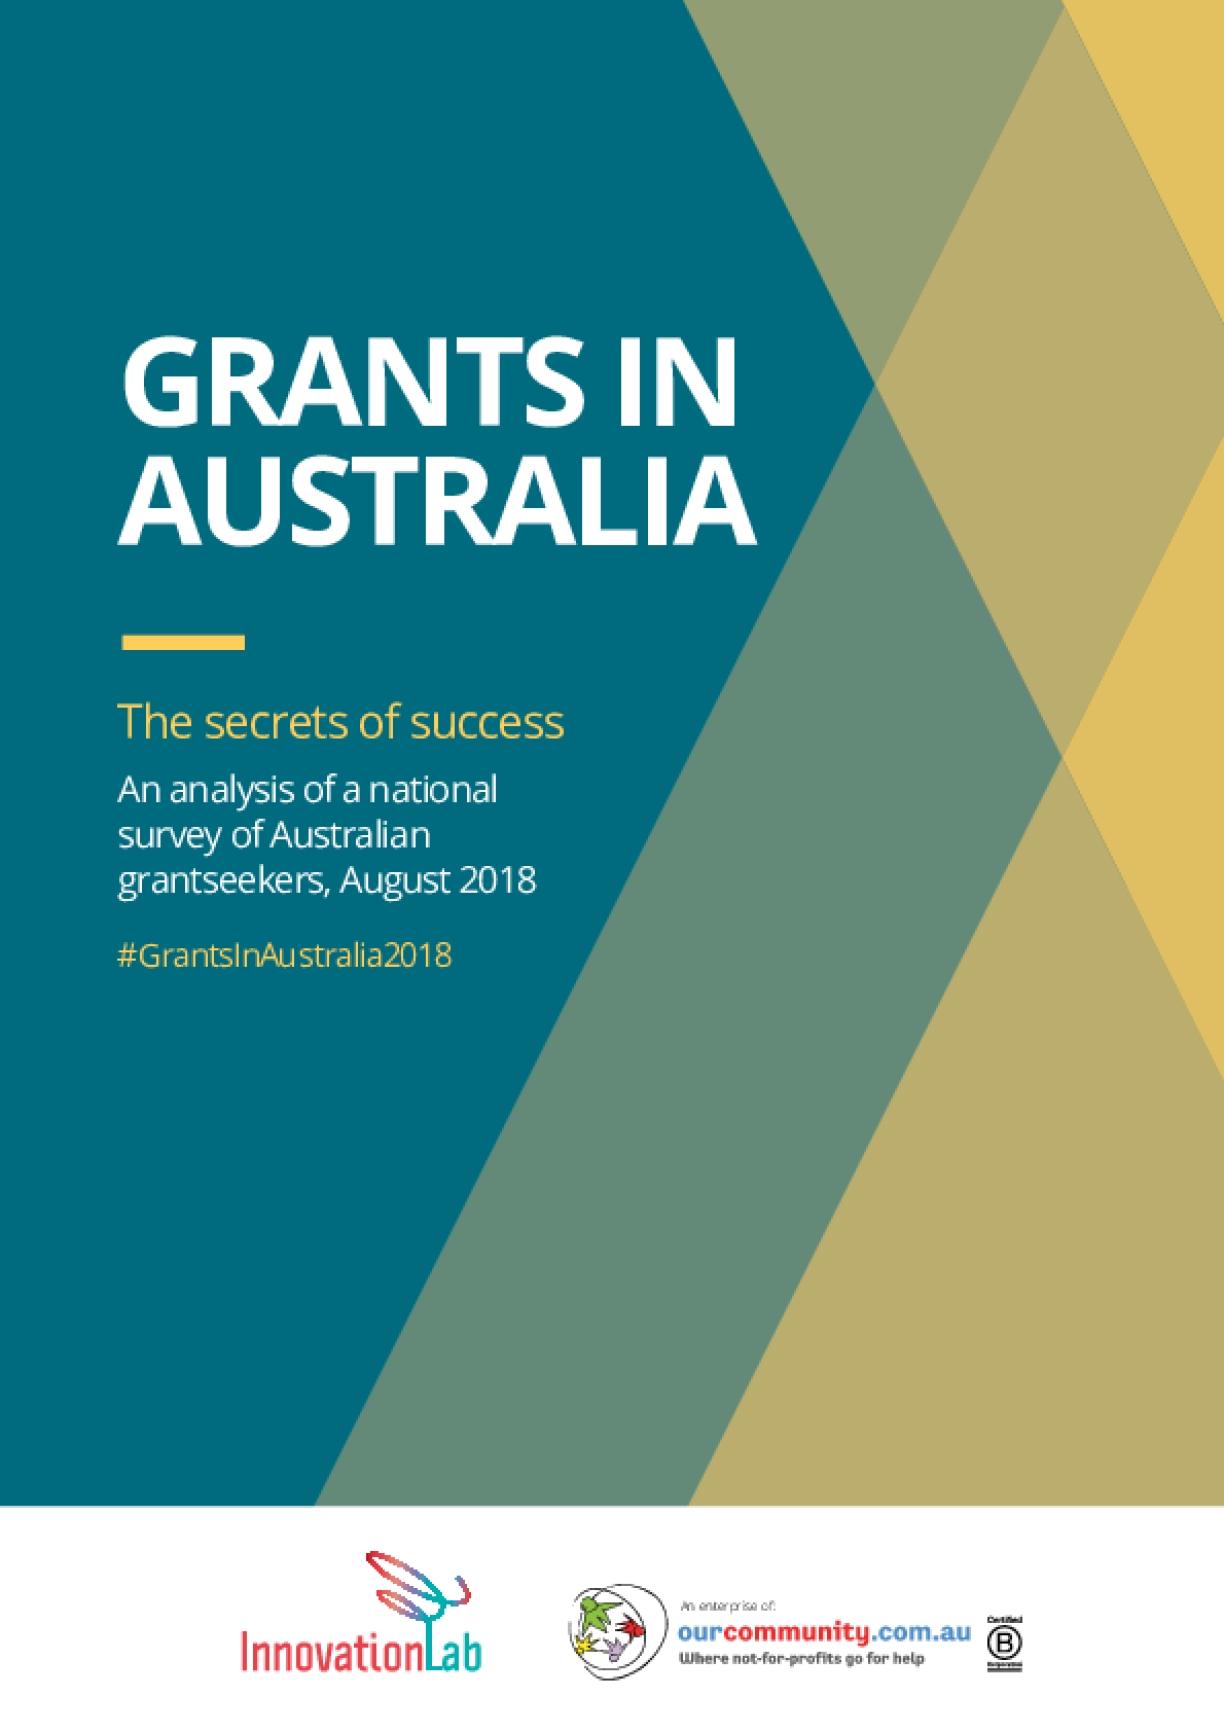 Grants in Australia: The secrets of success